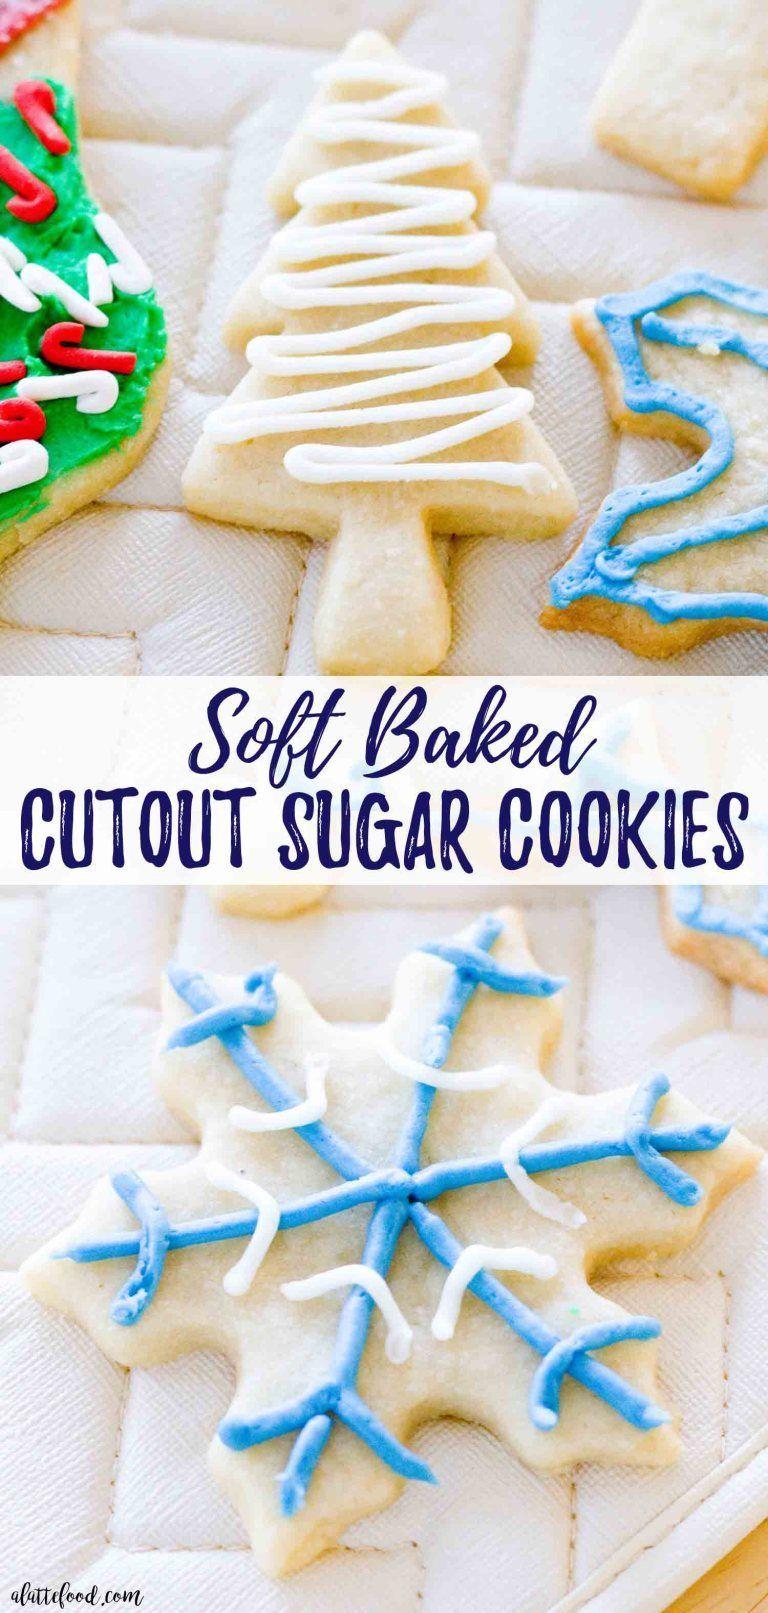 SoftBaked Cutout Sugar Cookies, 2020 Şekerli